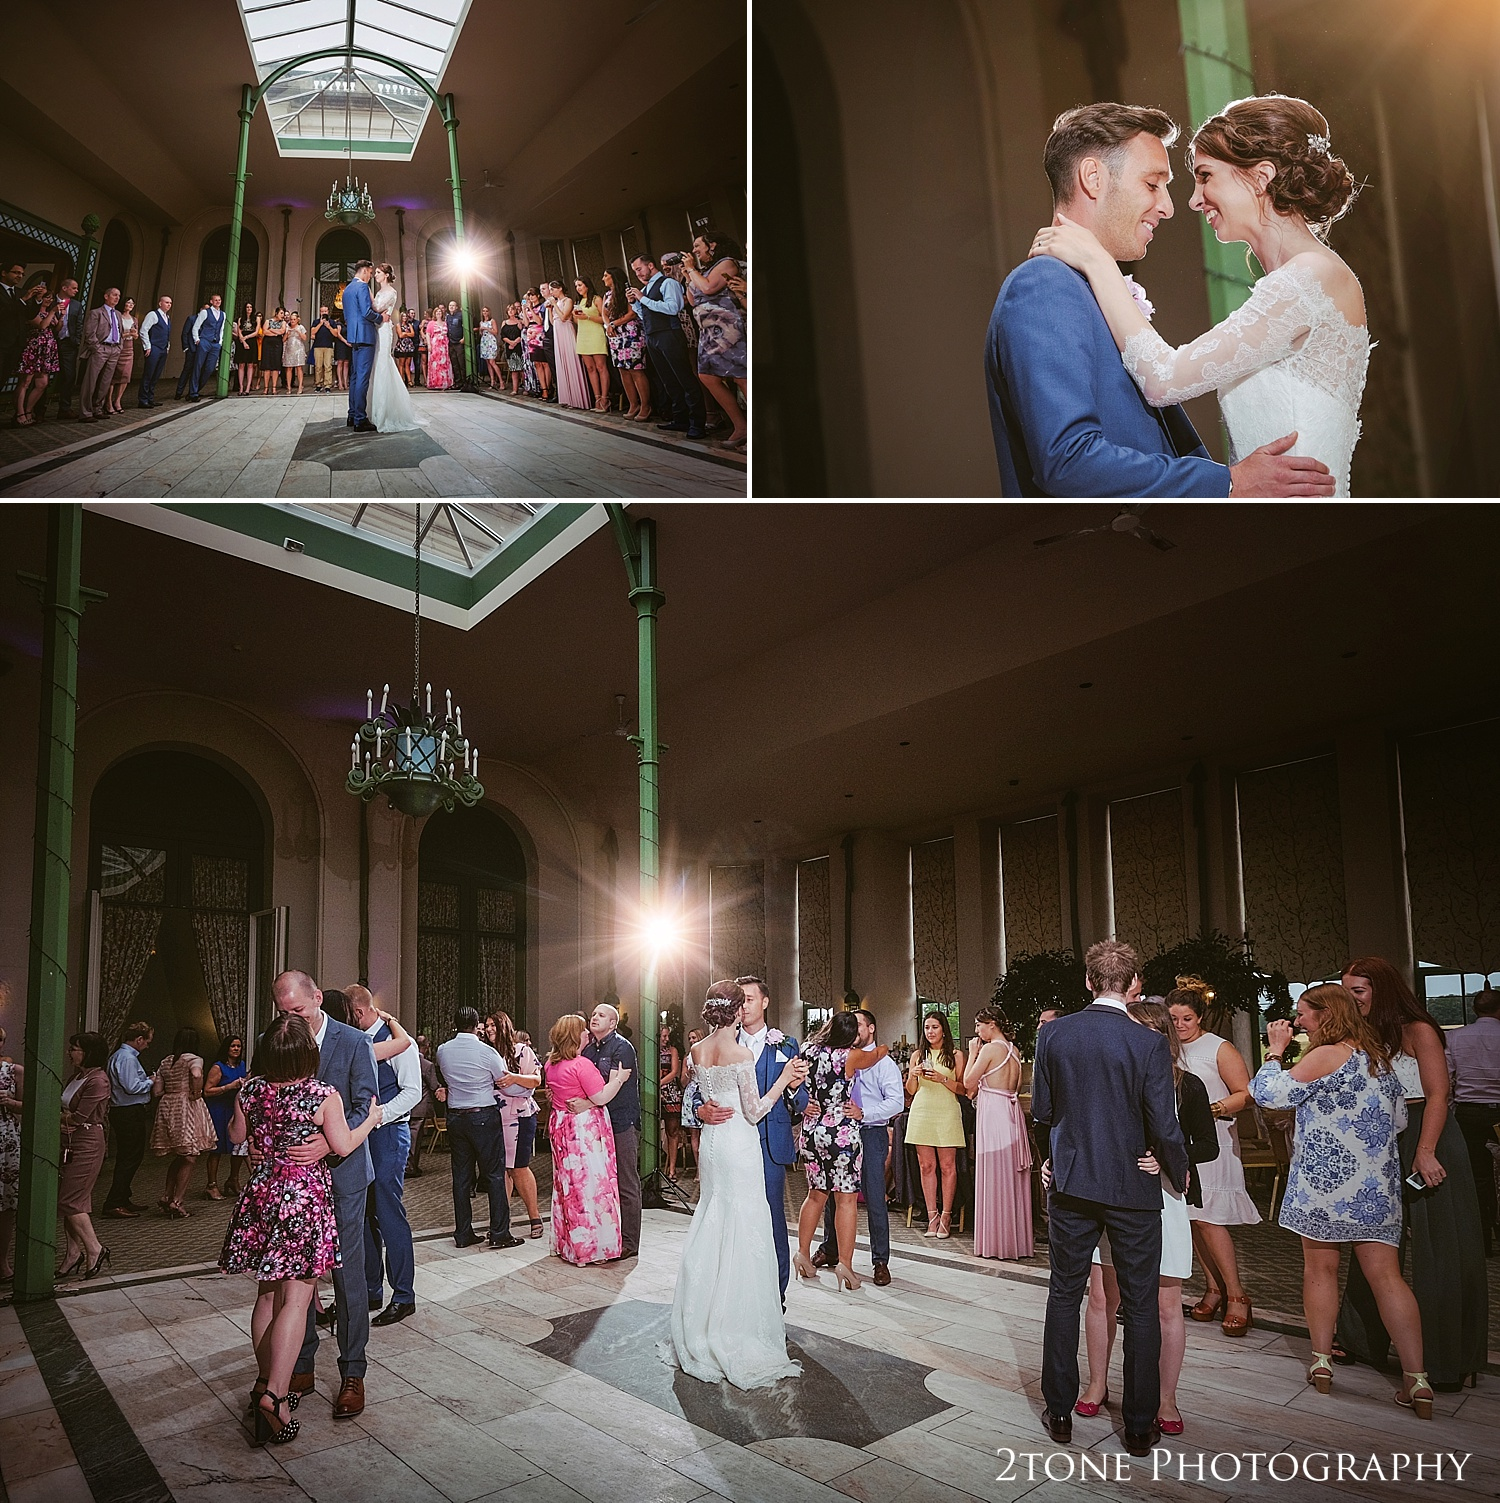 Wedding evening reception at Wynyard Hall by Durham based wedding photographers www.2tonephotography.co.uk